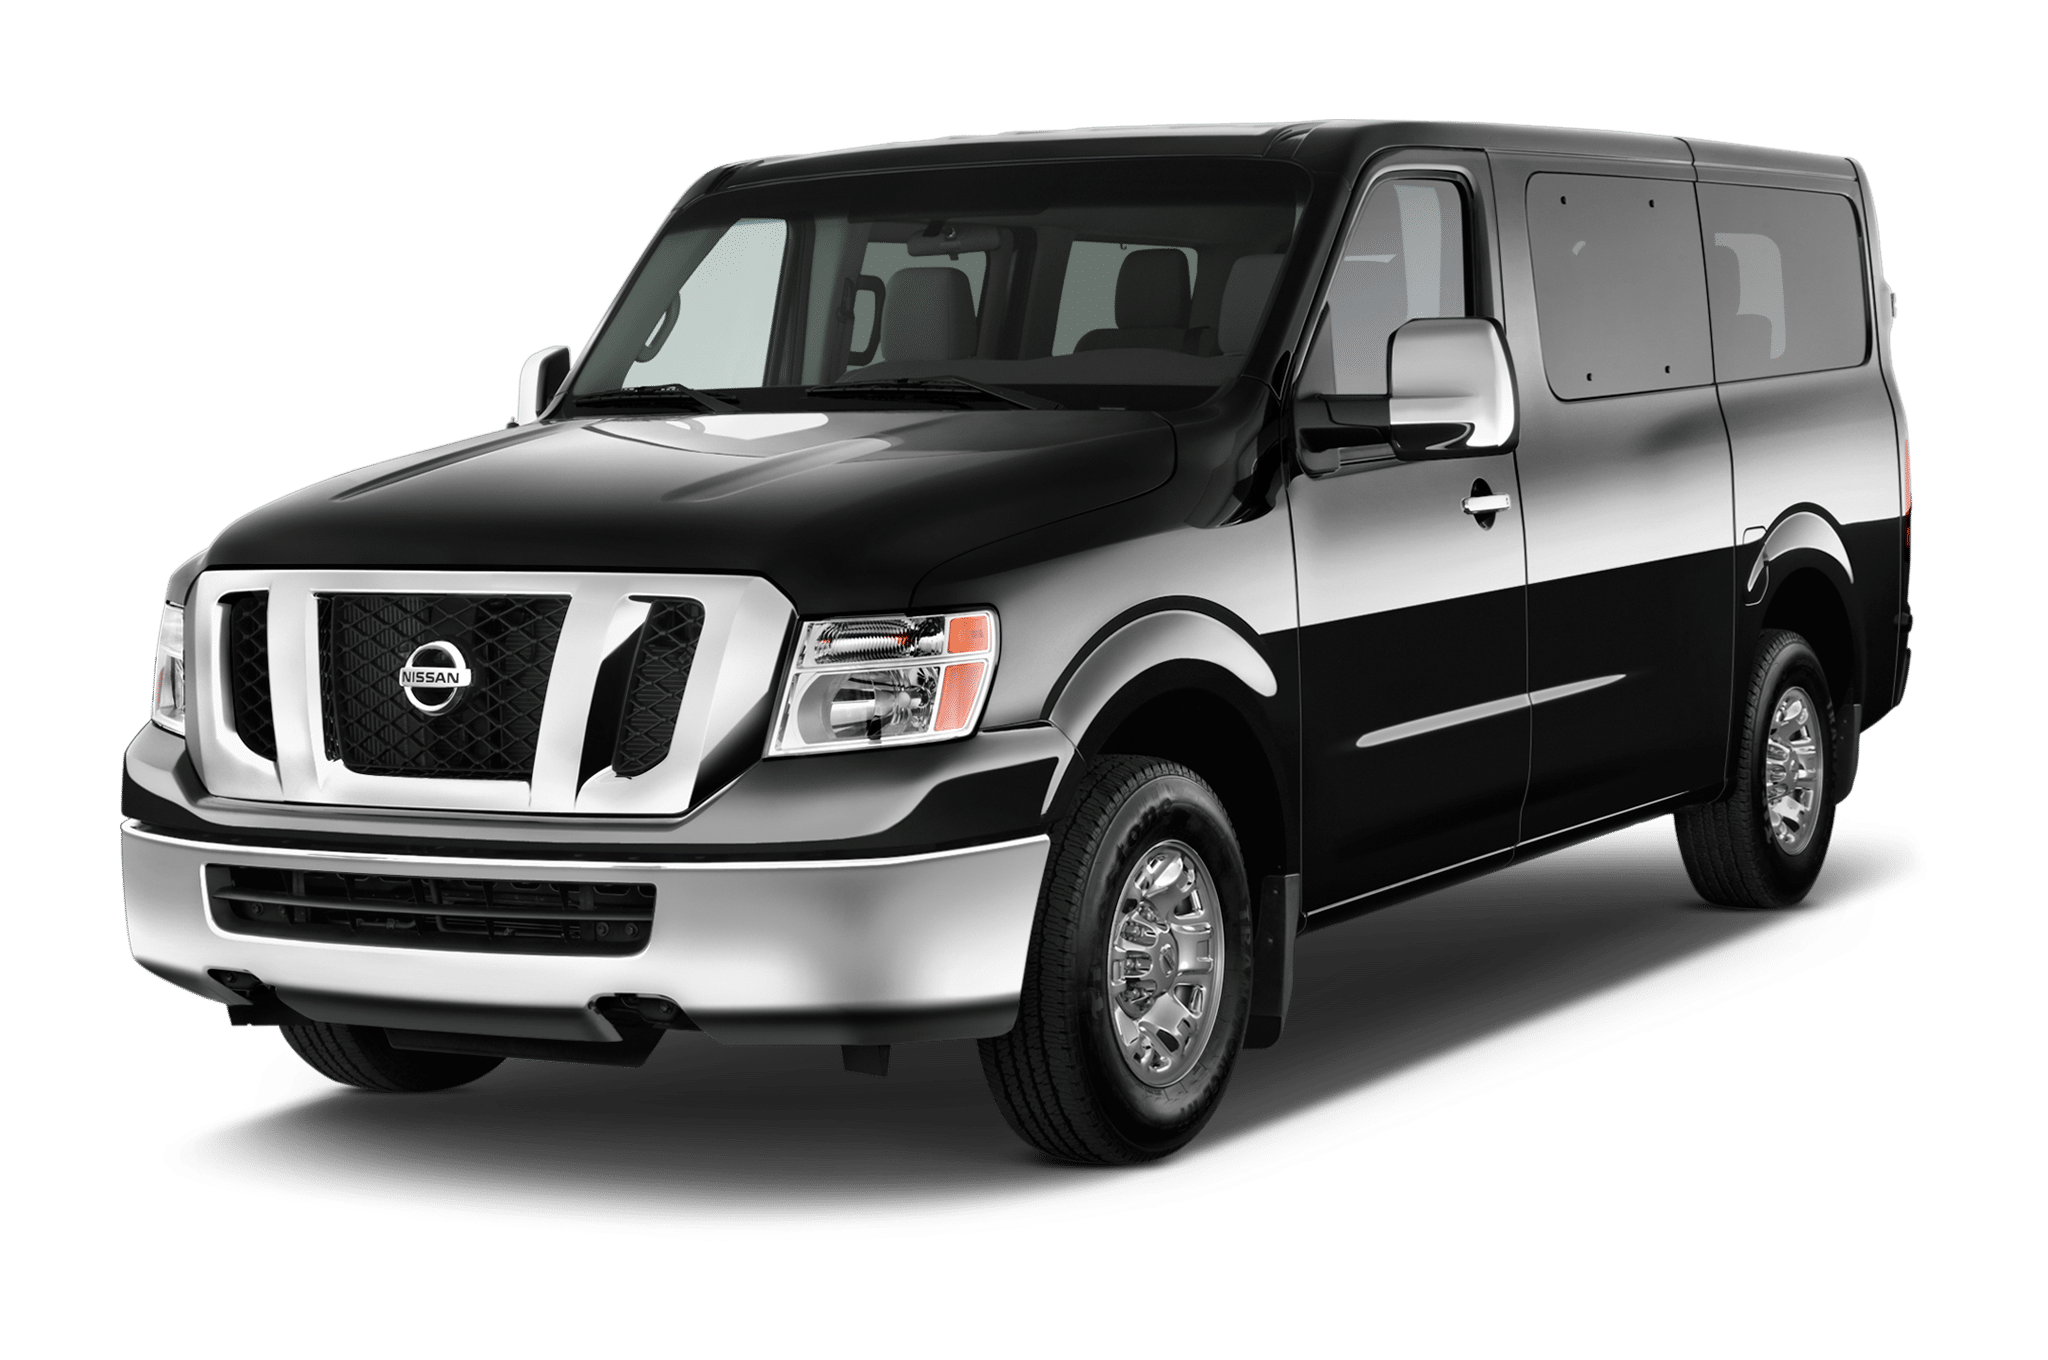 Black Nissan Van – Fort Lauderdale Airport Shuttle